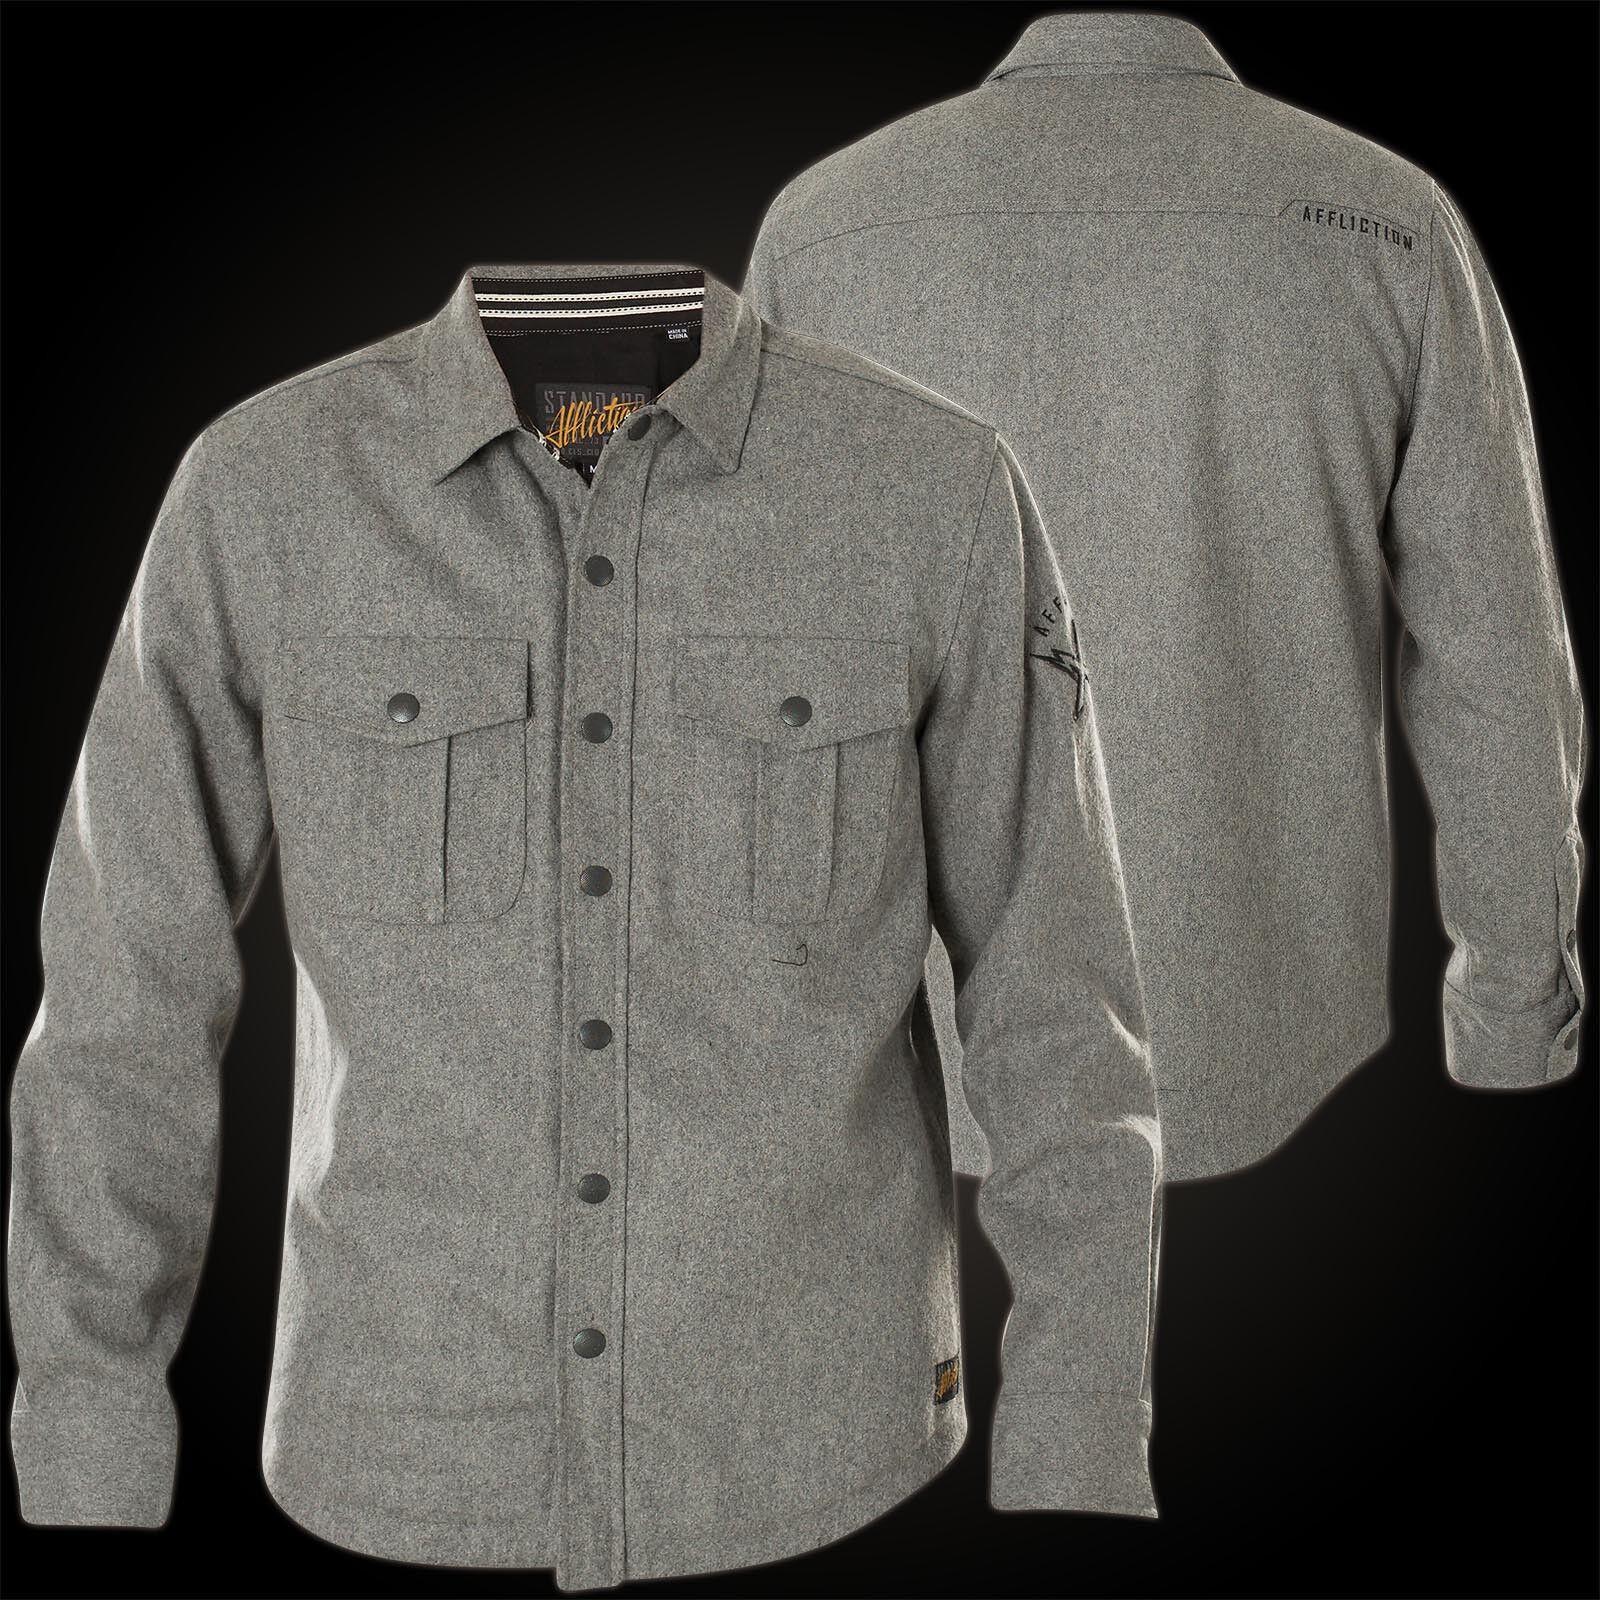 Affliction Jacket Take Back The Street Grey